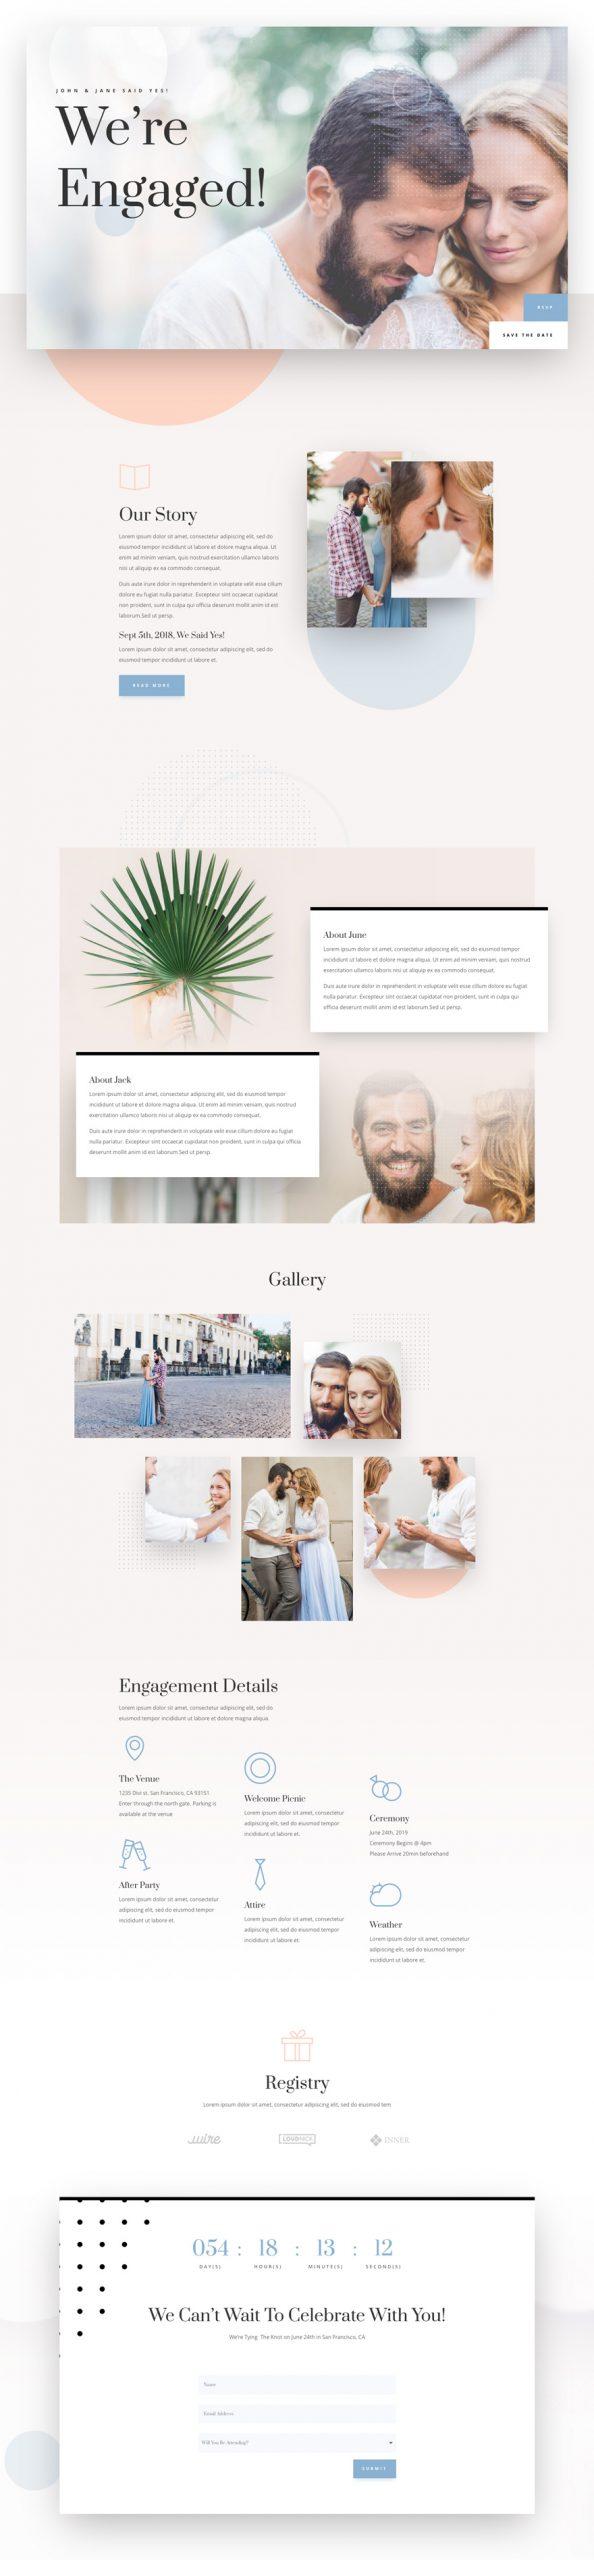 wedding engagement landing page scaled